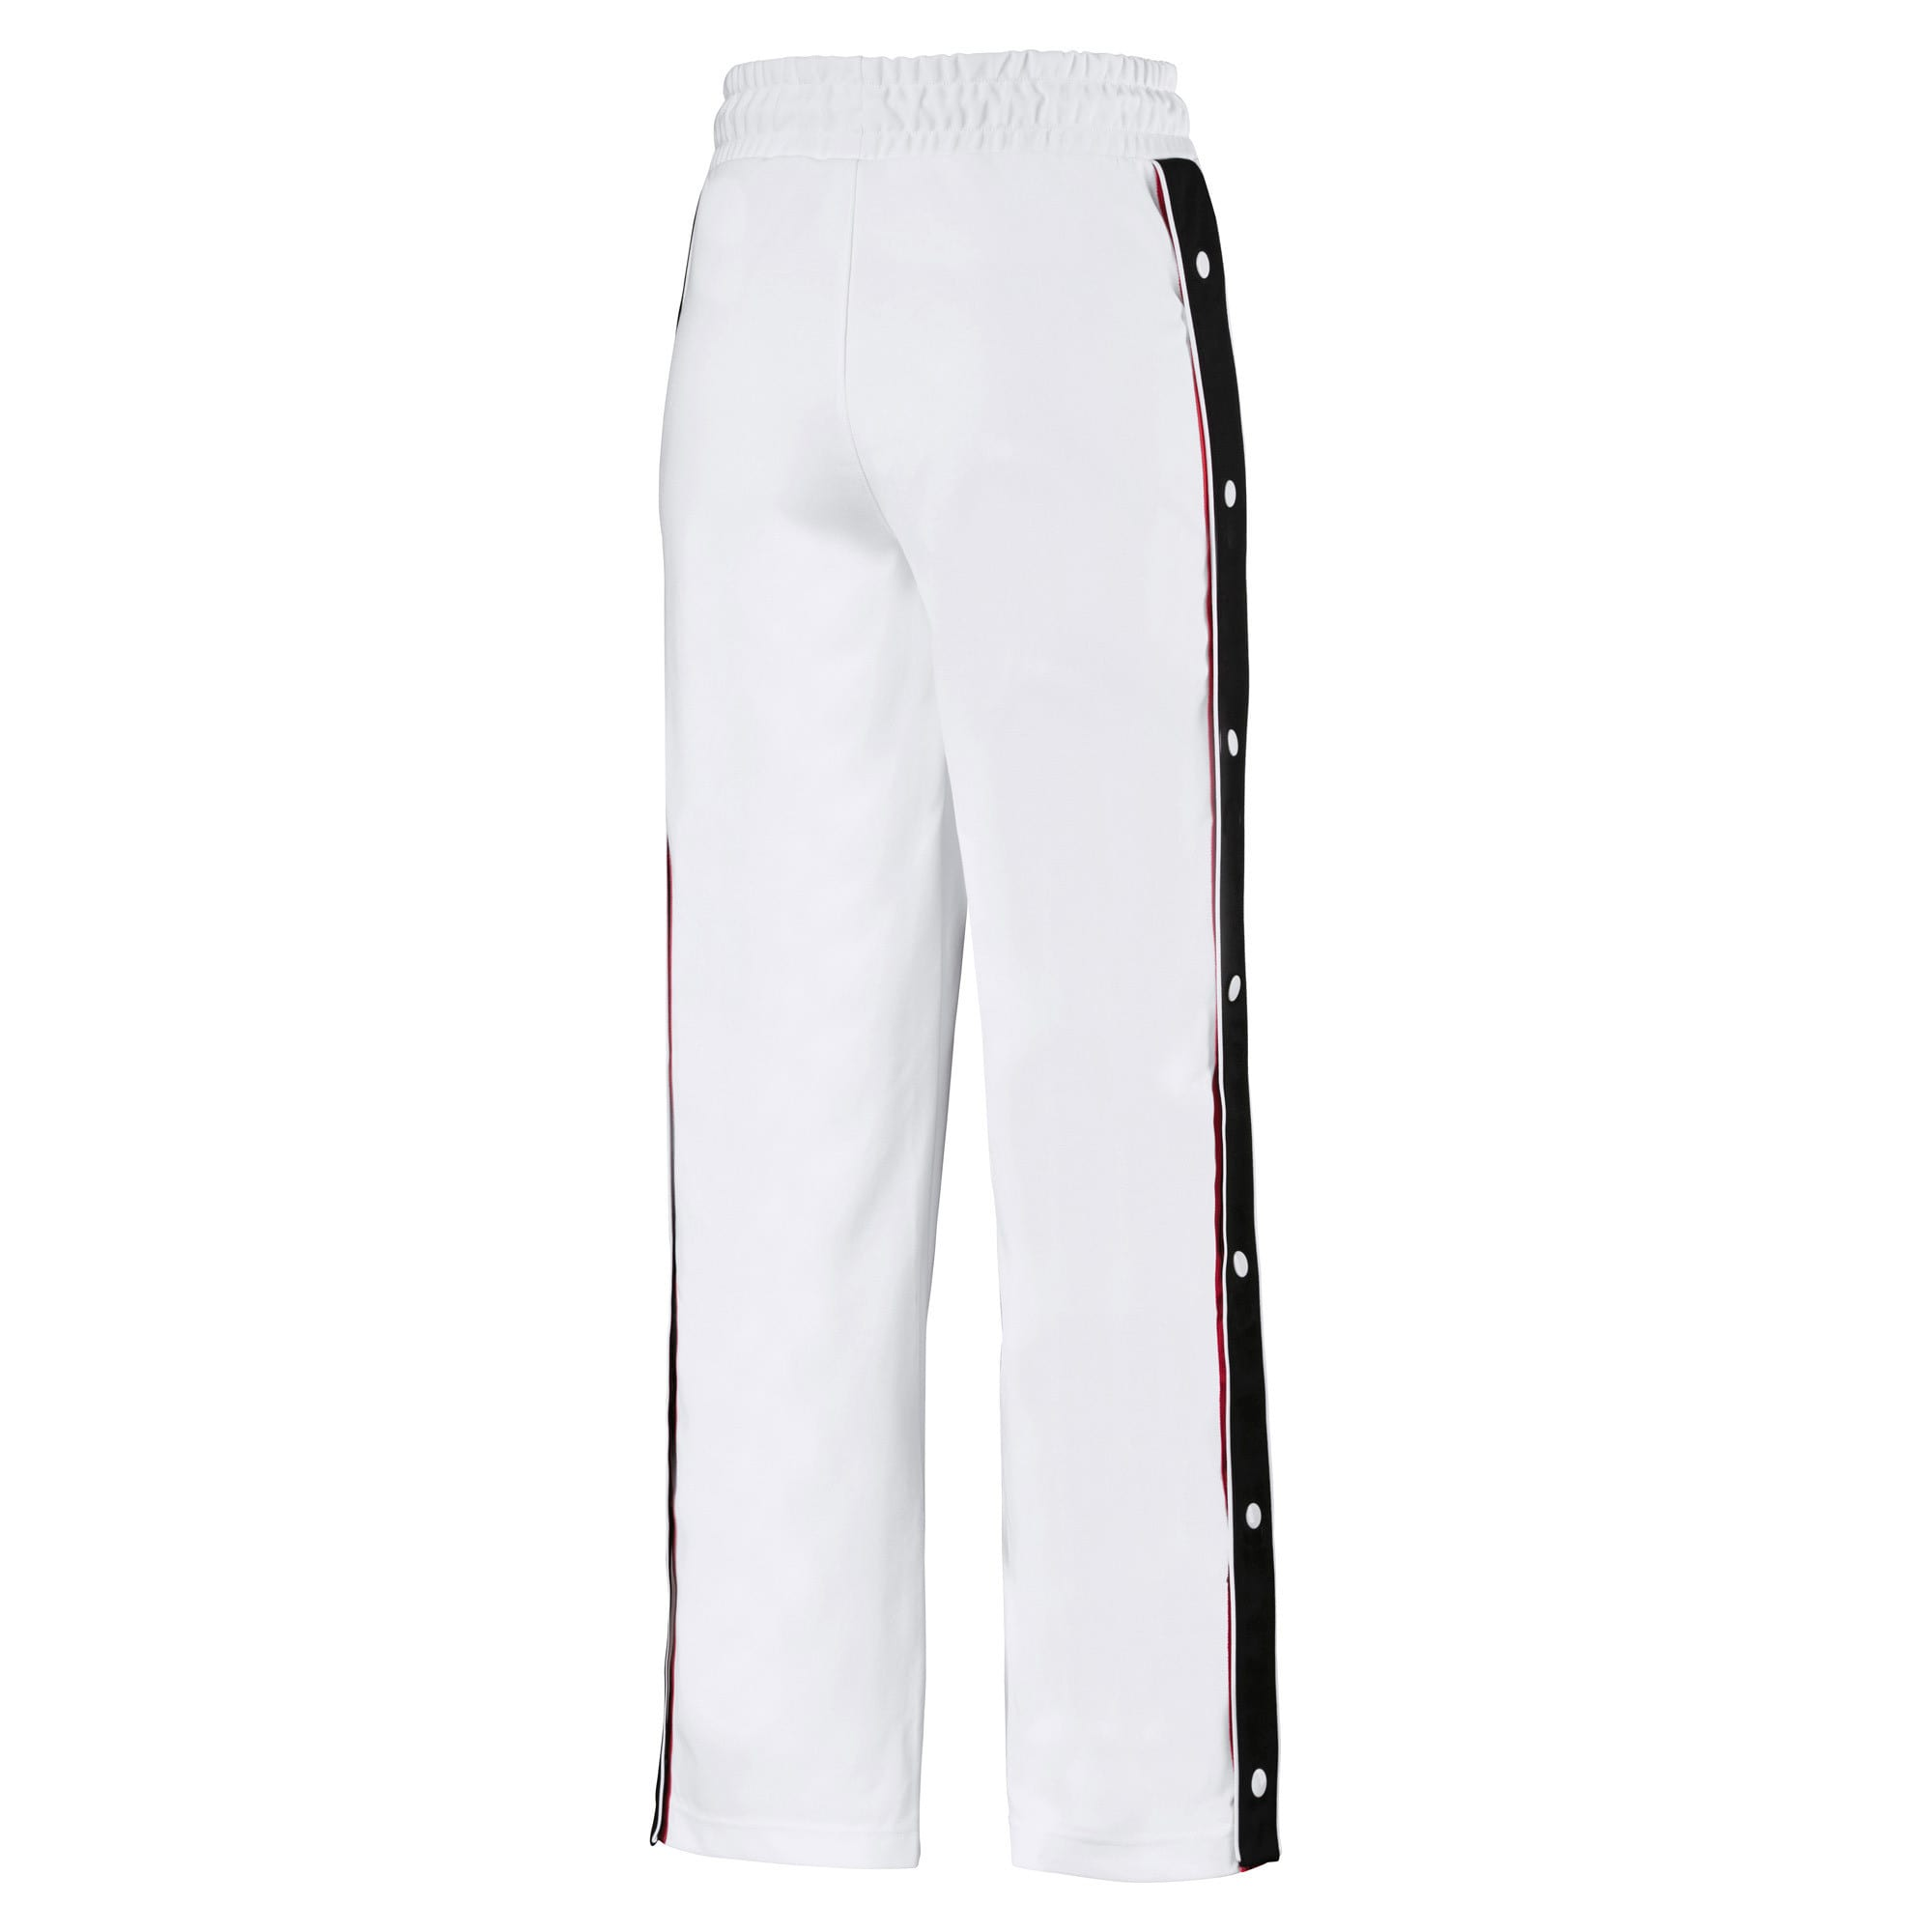 Thumbnail 5 of PUMA x KARL LAGERFELD Women's Wide Pants, Puma White, medium